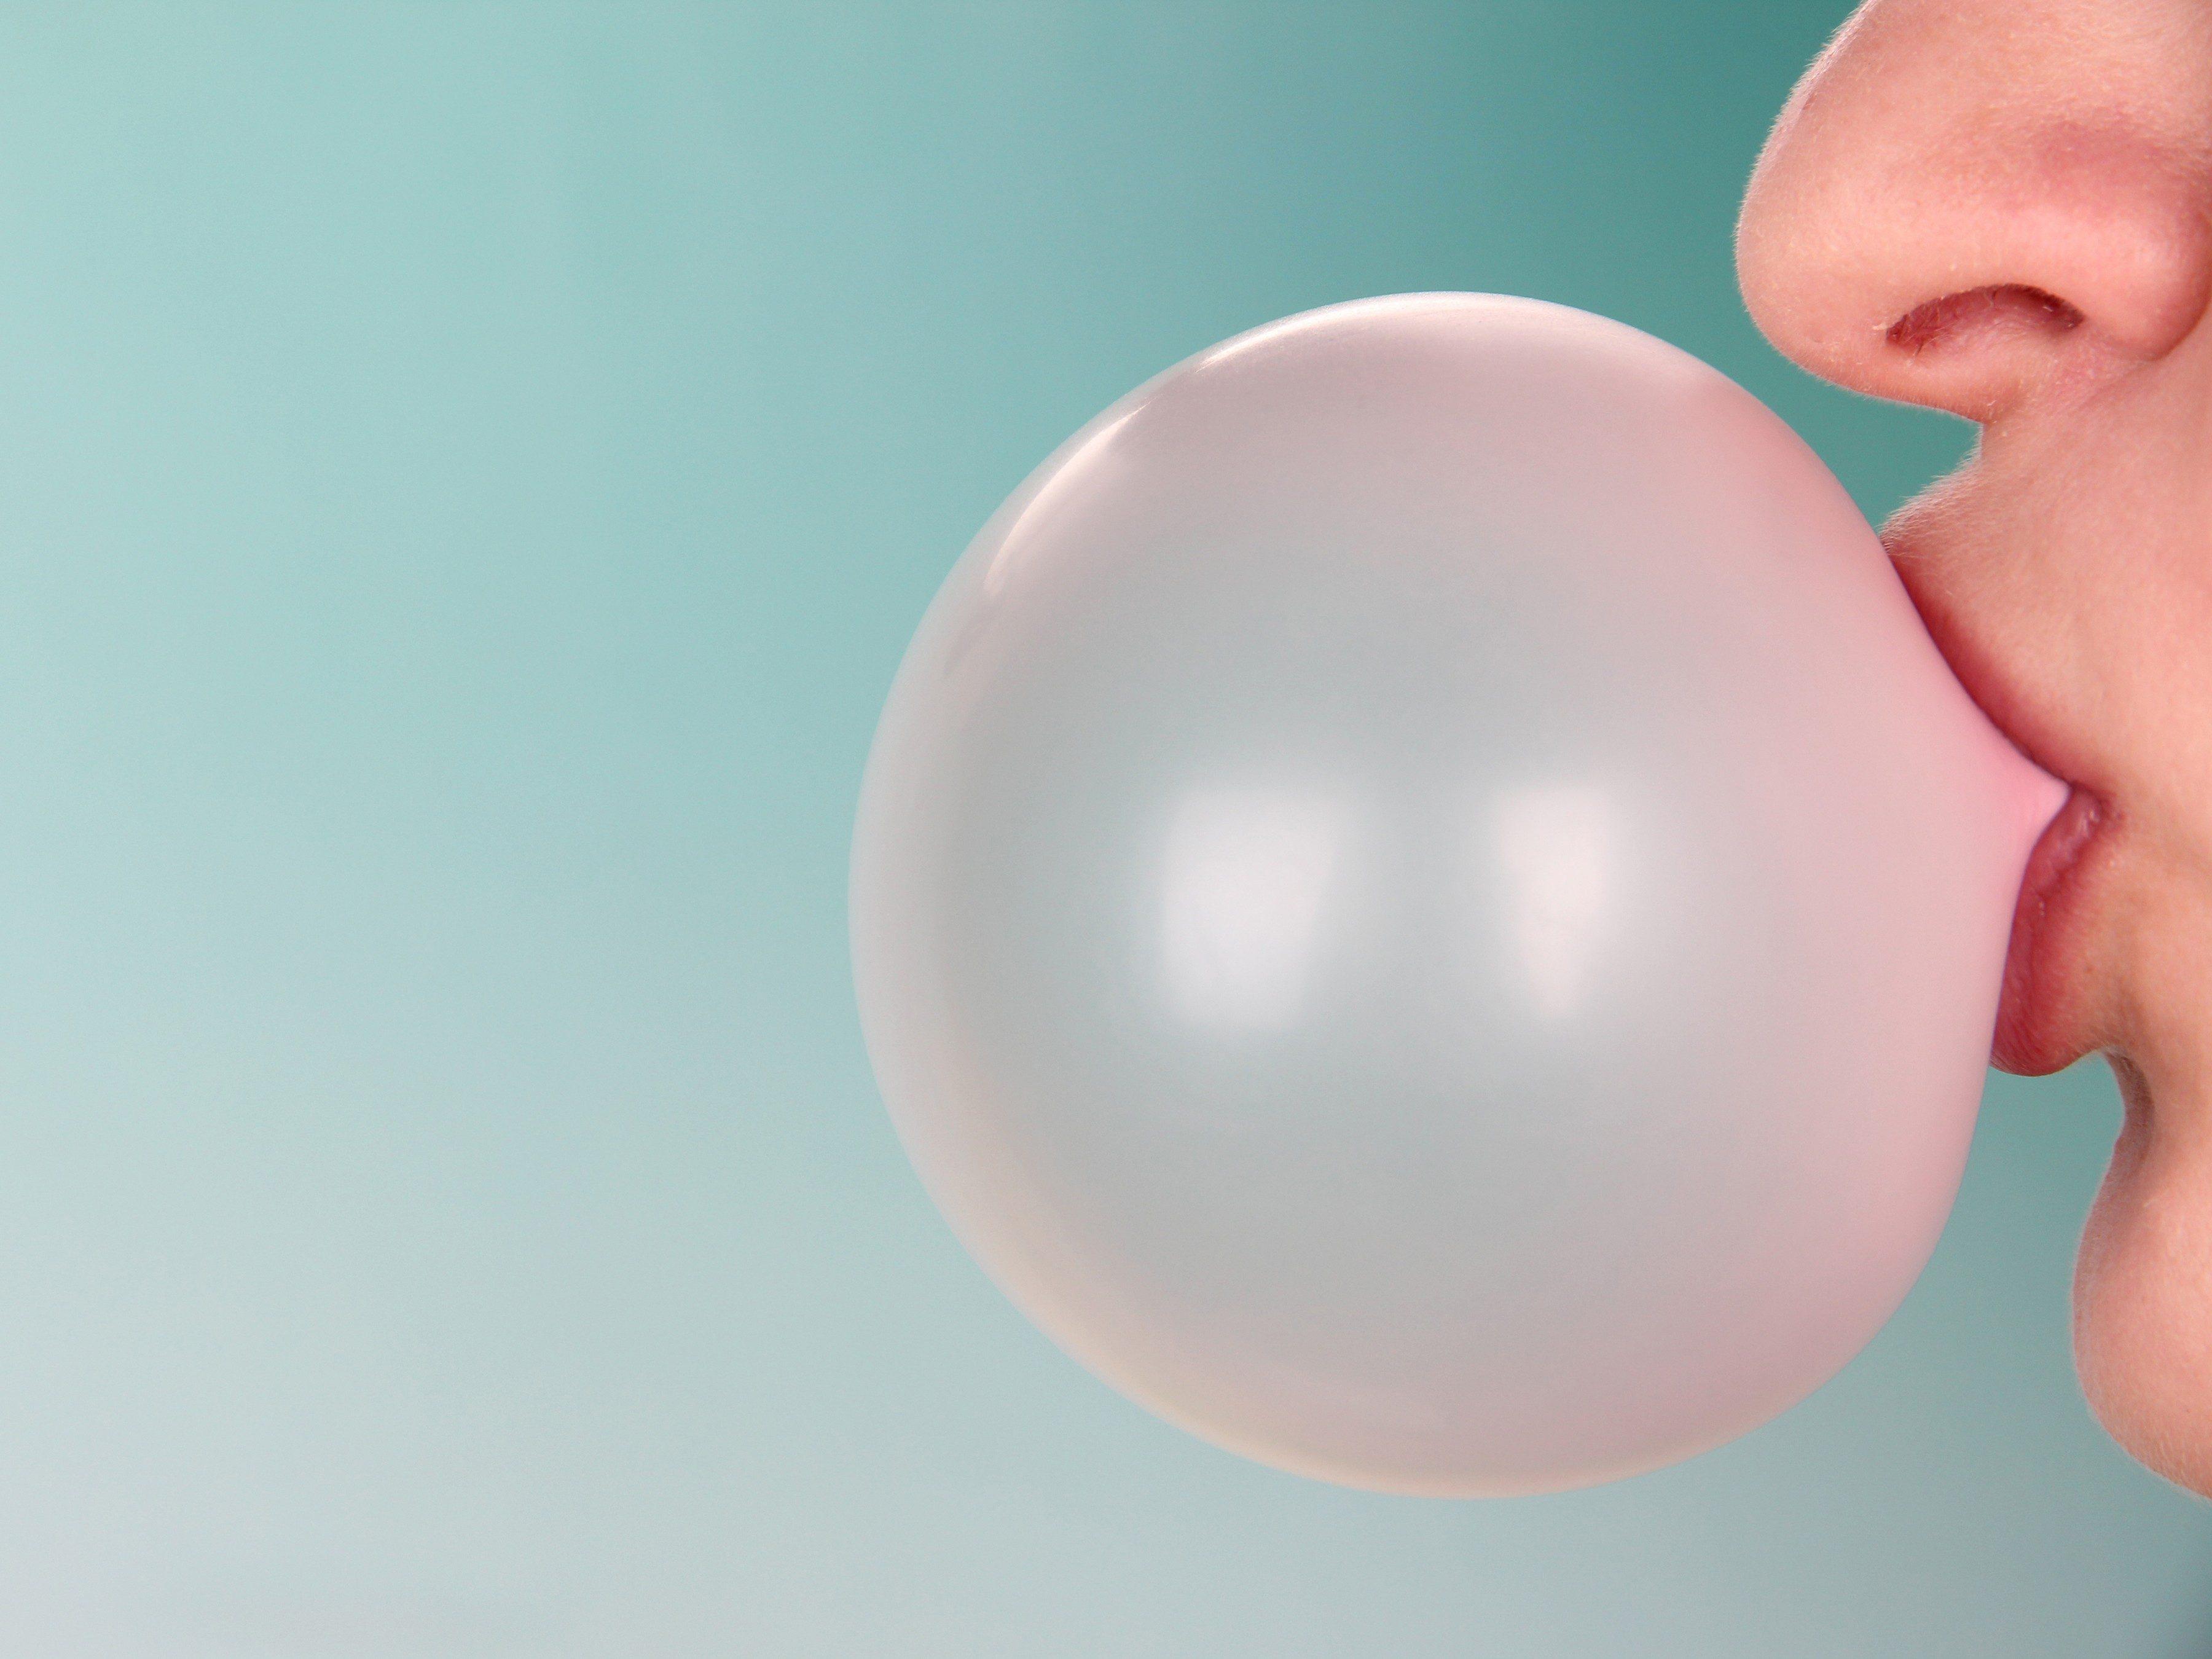 11. Chew gum; cut down stress.